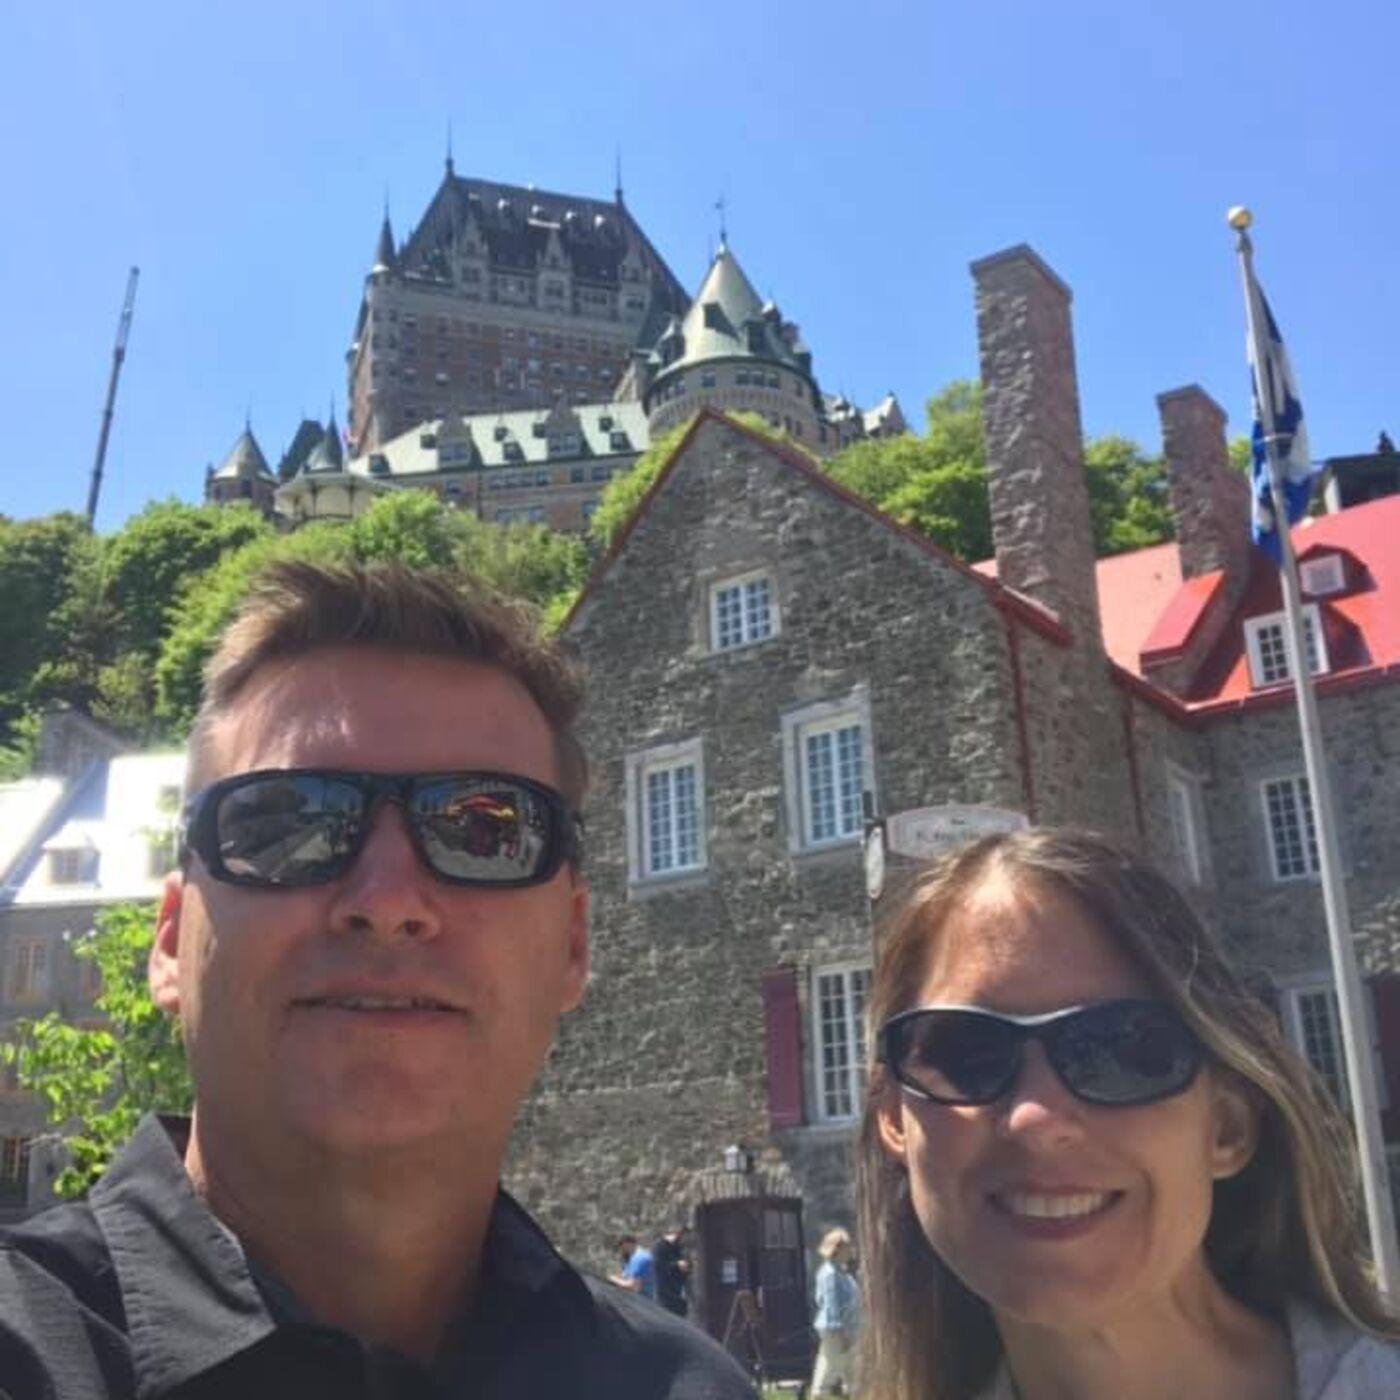 #29 Travel With Us by Warren & Julie